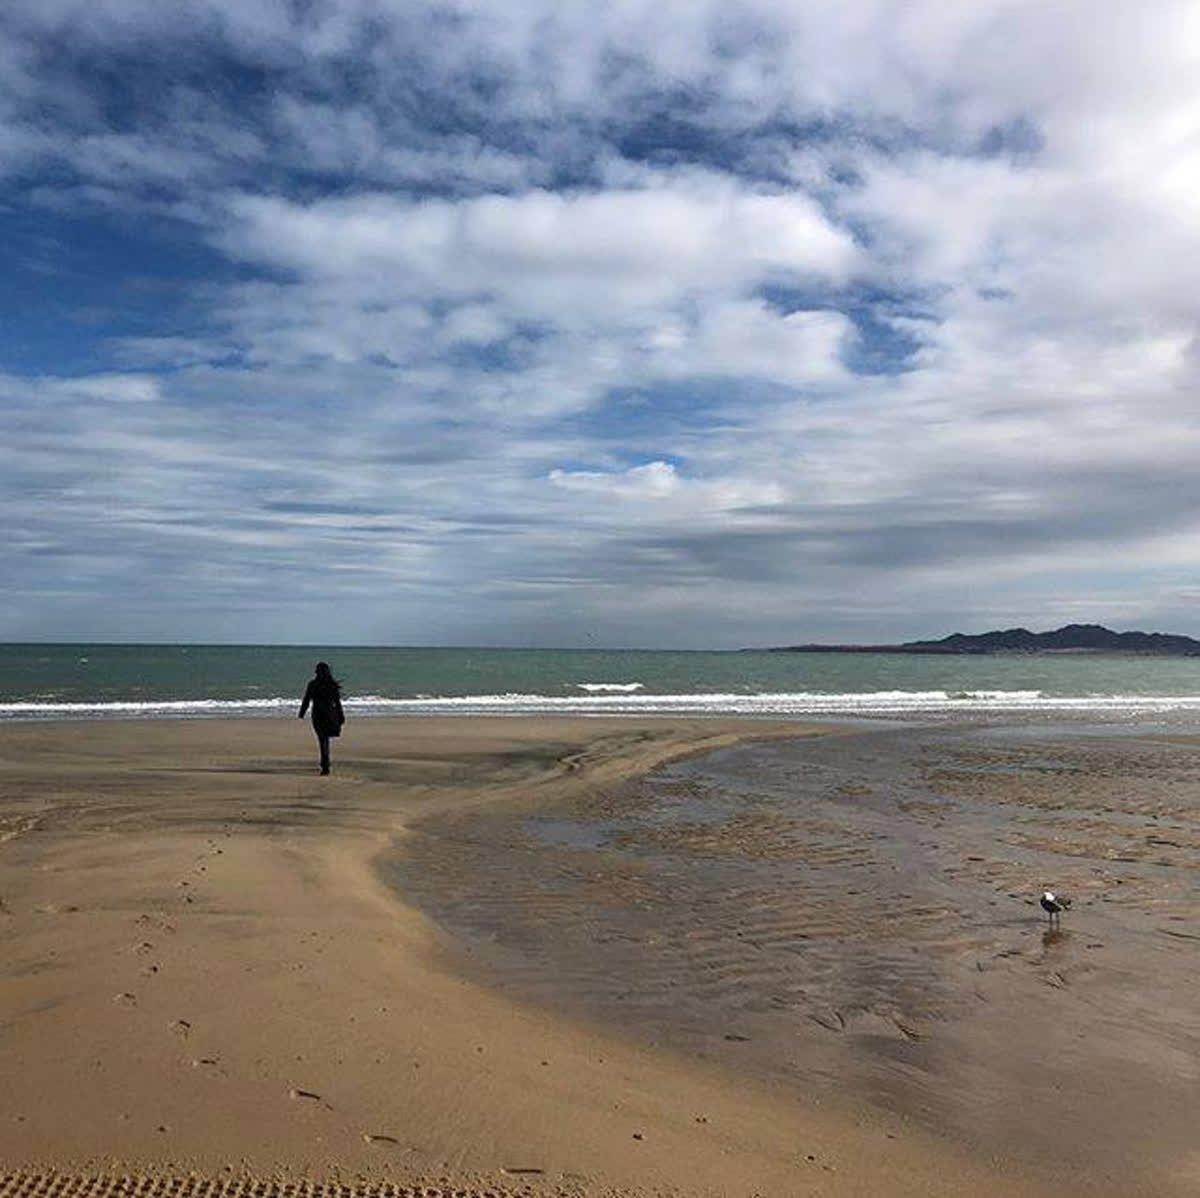 """No bad days"" in #SanFelipe! 😊Visit: http://www.descubresanfelipe.com📷just.w3ndy@BajaNorteTravel @TurismoMexicali @SECTUR_mx @ElCastorOficial #FelizMartes #HappYtuesday #Verano#Playa #Beach #Turismo #Tourism #Beachlife #NewPost #FelizDia #FelizViernes #Waves #ola"